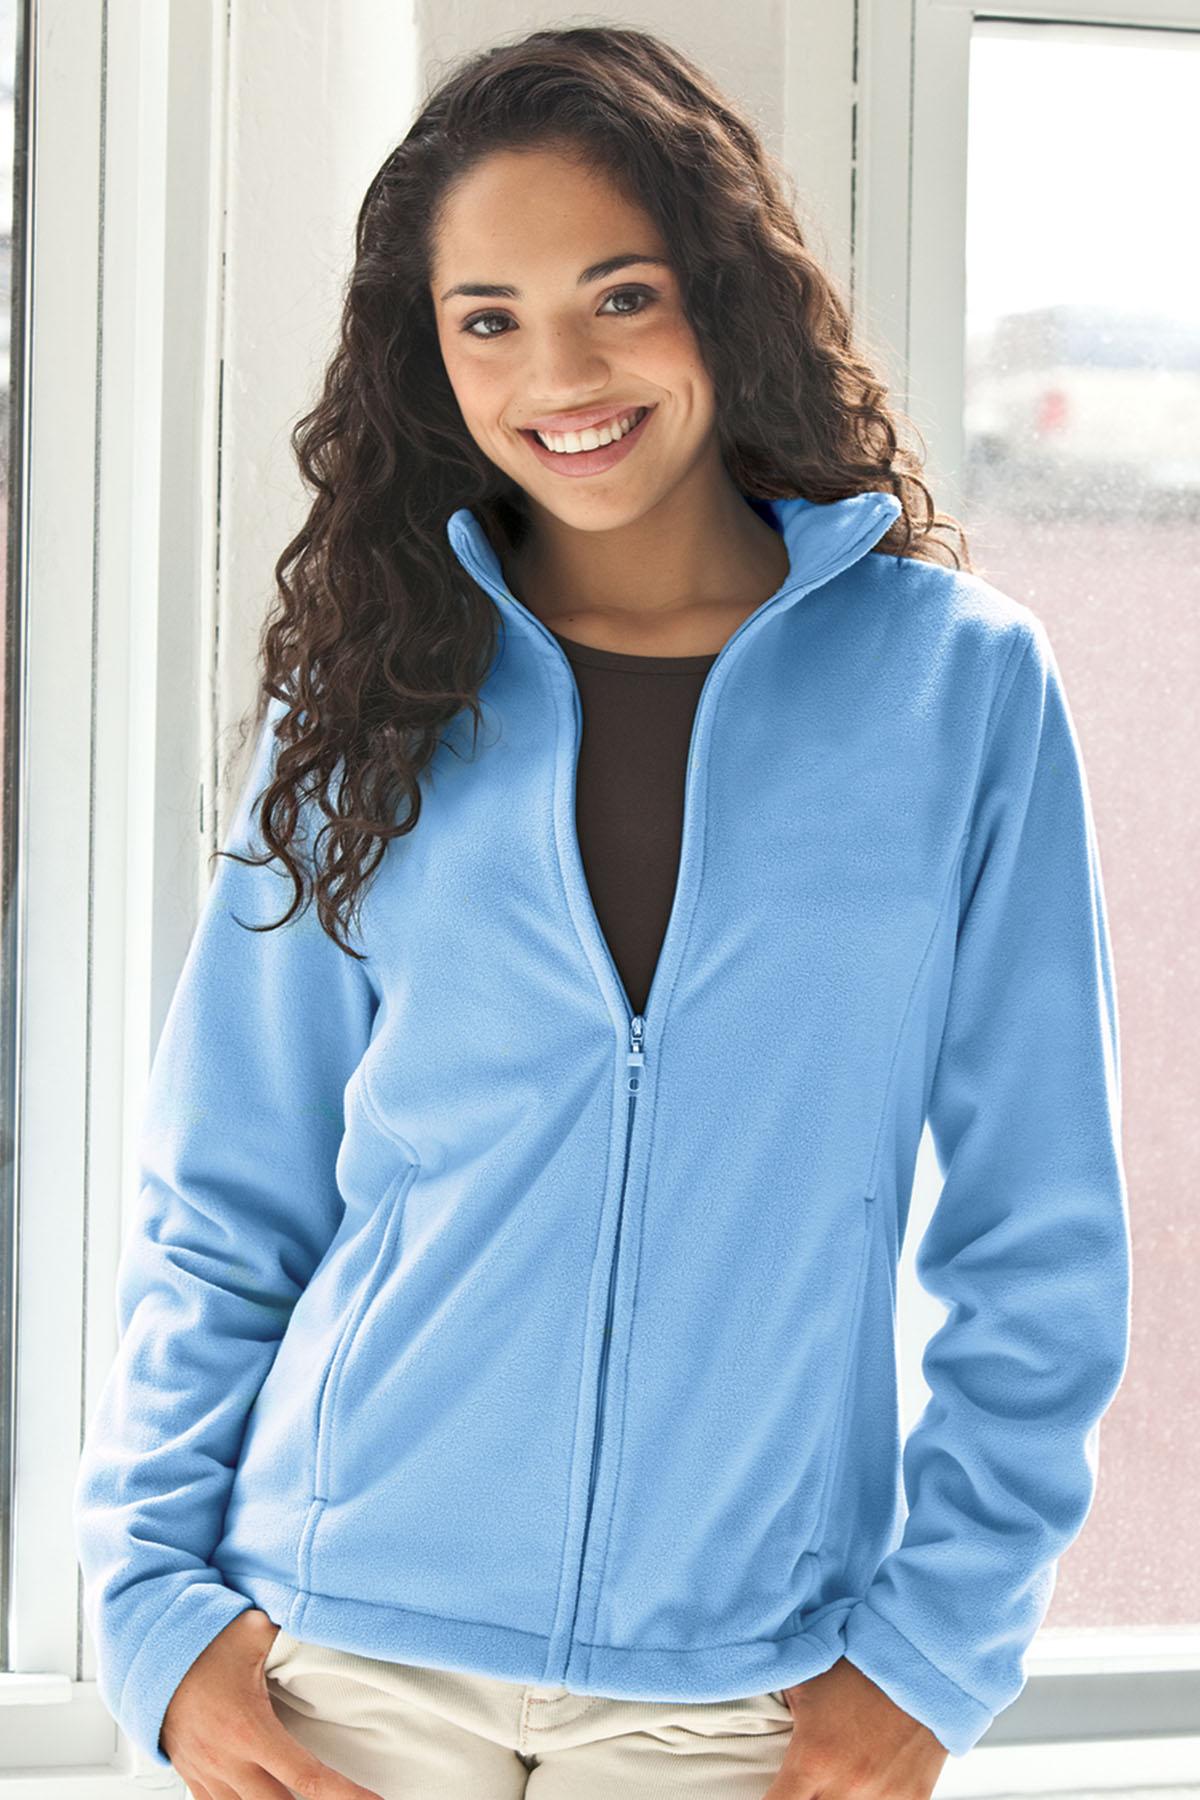 Vantage 3266 - Women's Vantek Microfiber Full-Zip Jacket